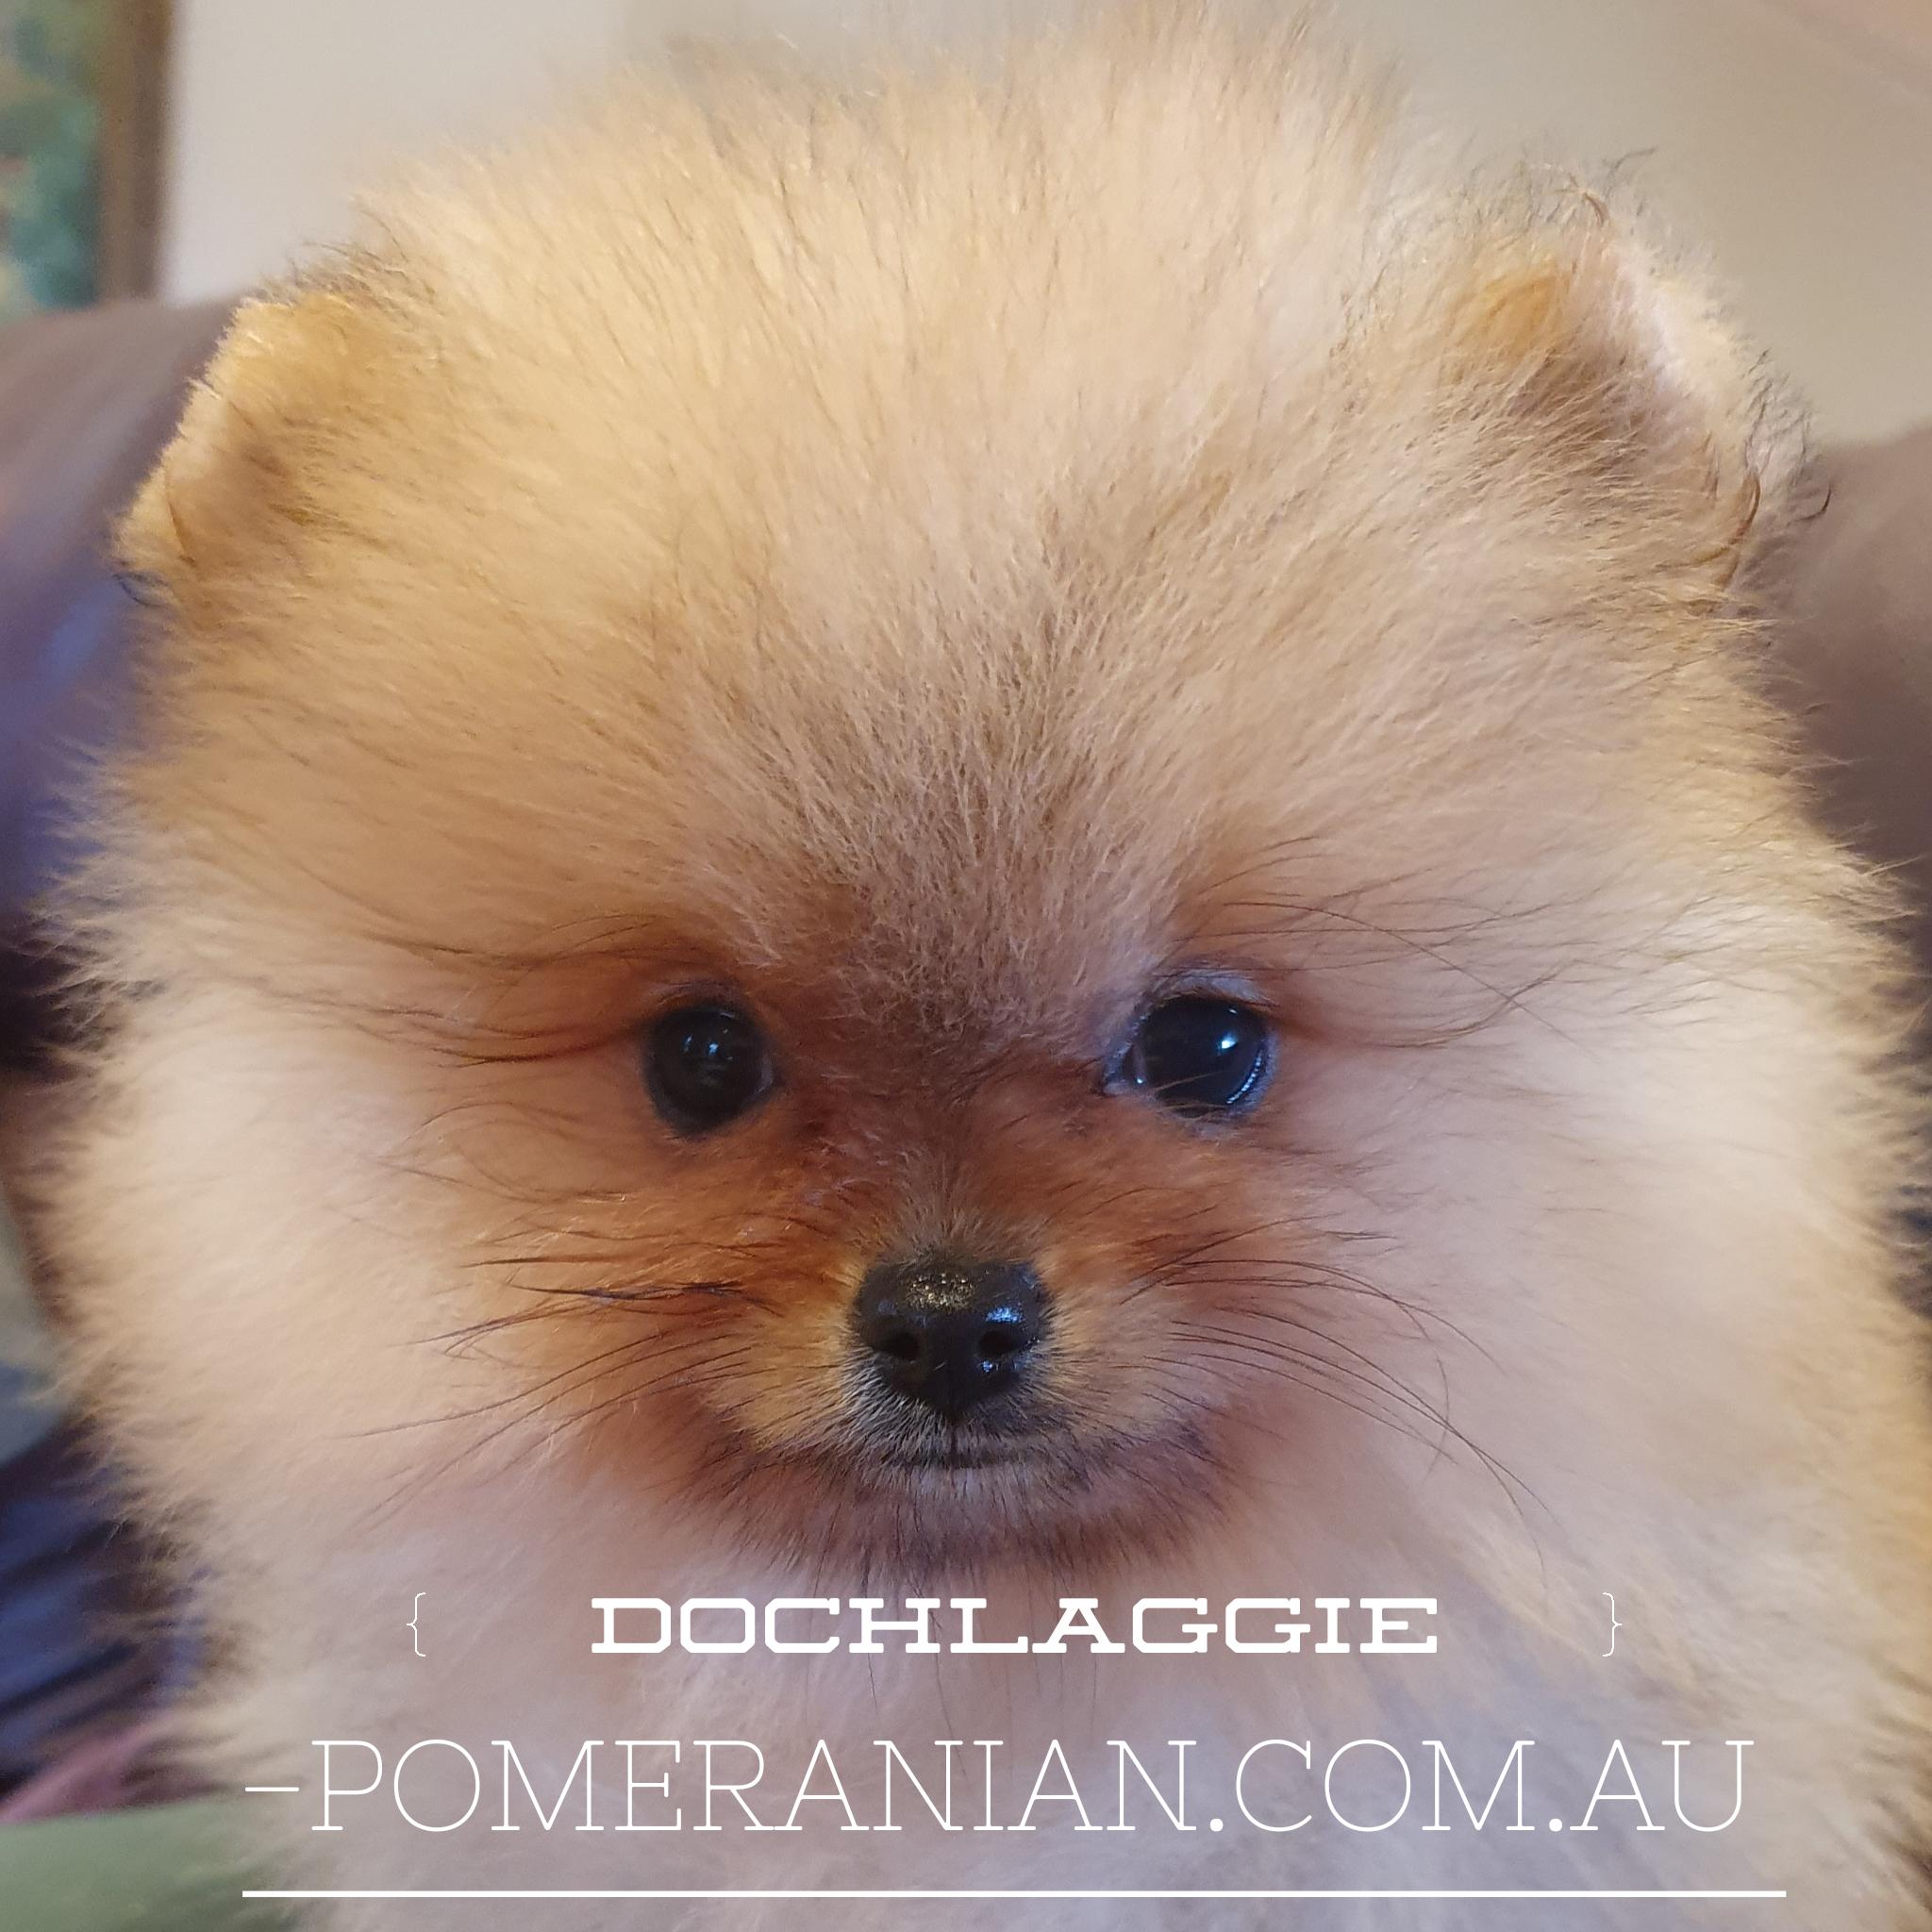 Dochlaggie Pomeranian Puppies Melbourne Dochlaggie Dochlaggiepomeranians Pomeranians Pomeranian Pomeraniandog Pomeranian Puppy Puppies Dog Quotes